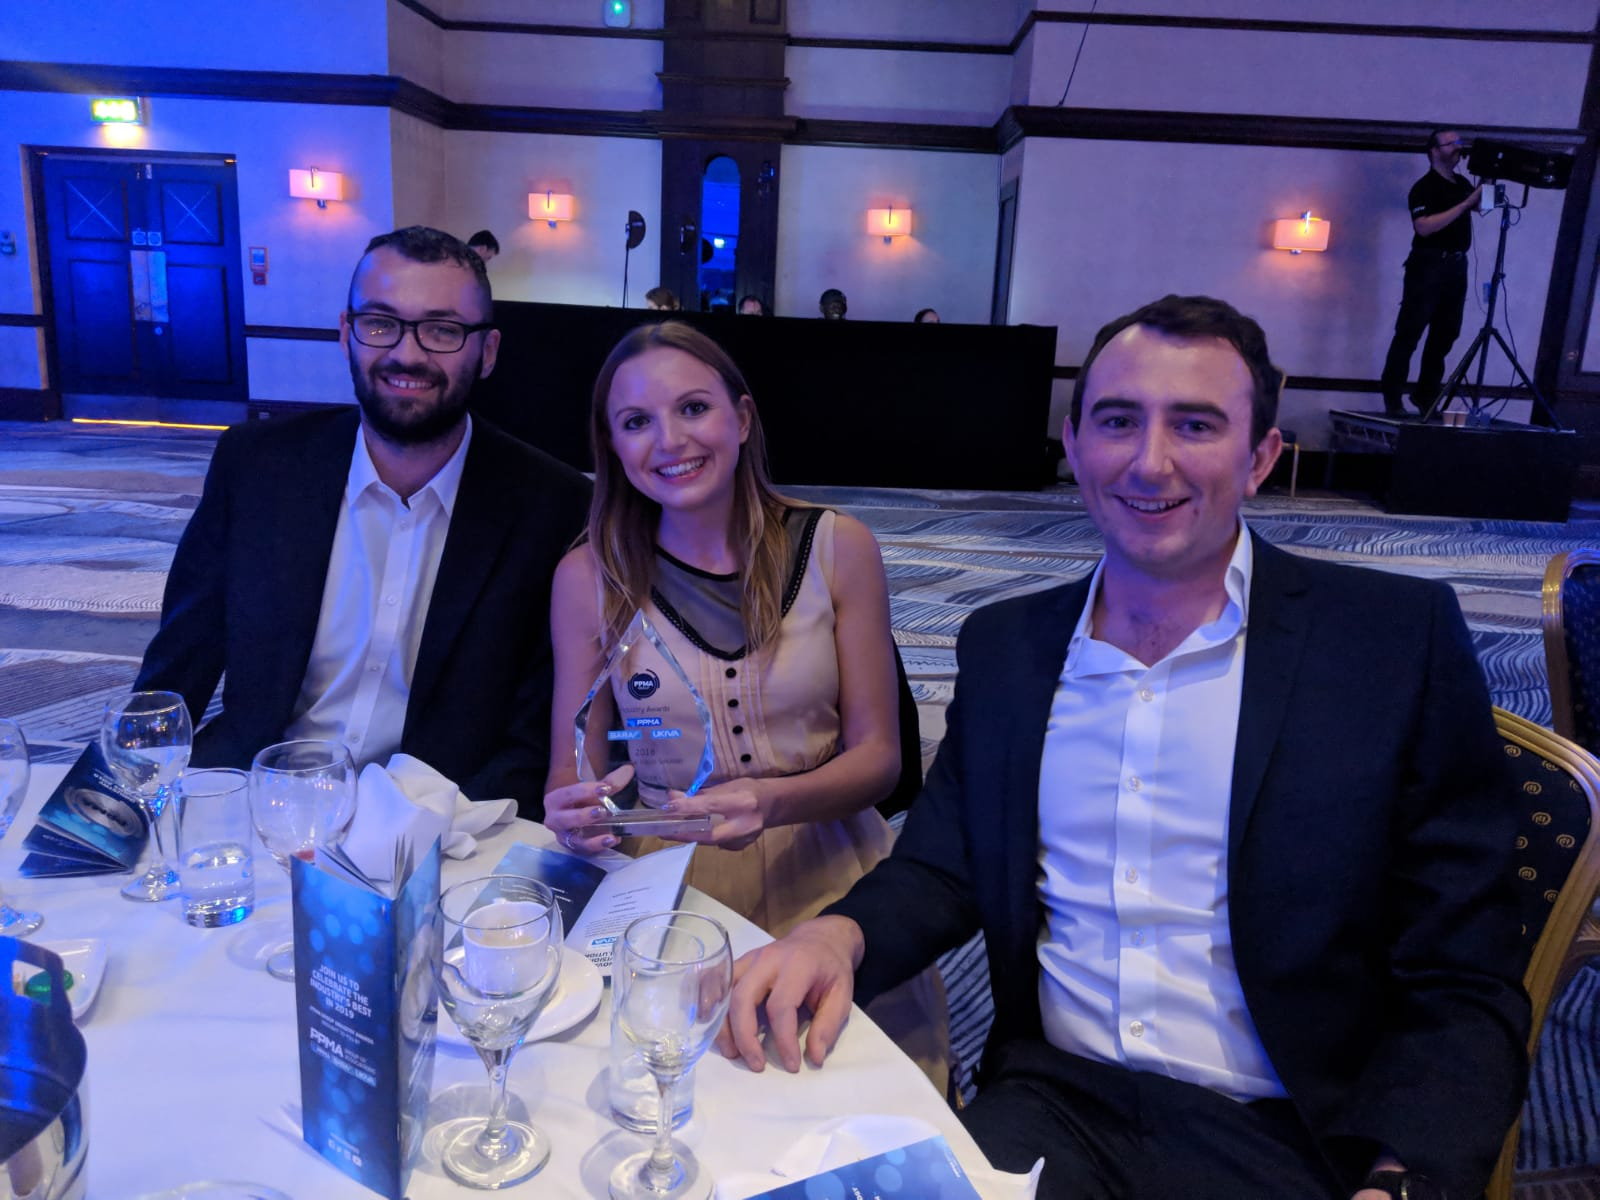 Innovative Vision Solution Award & Apprentice of the Year - PPMA awards